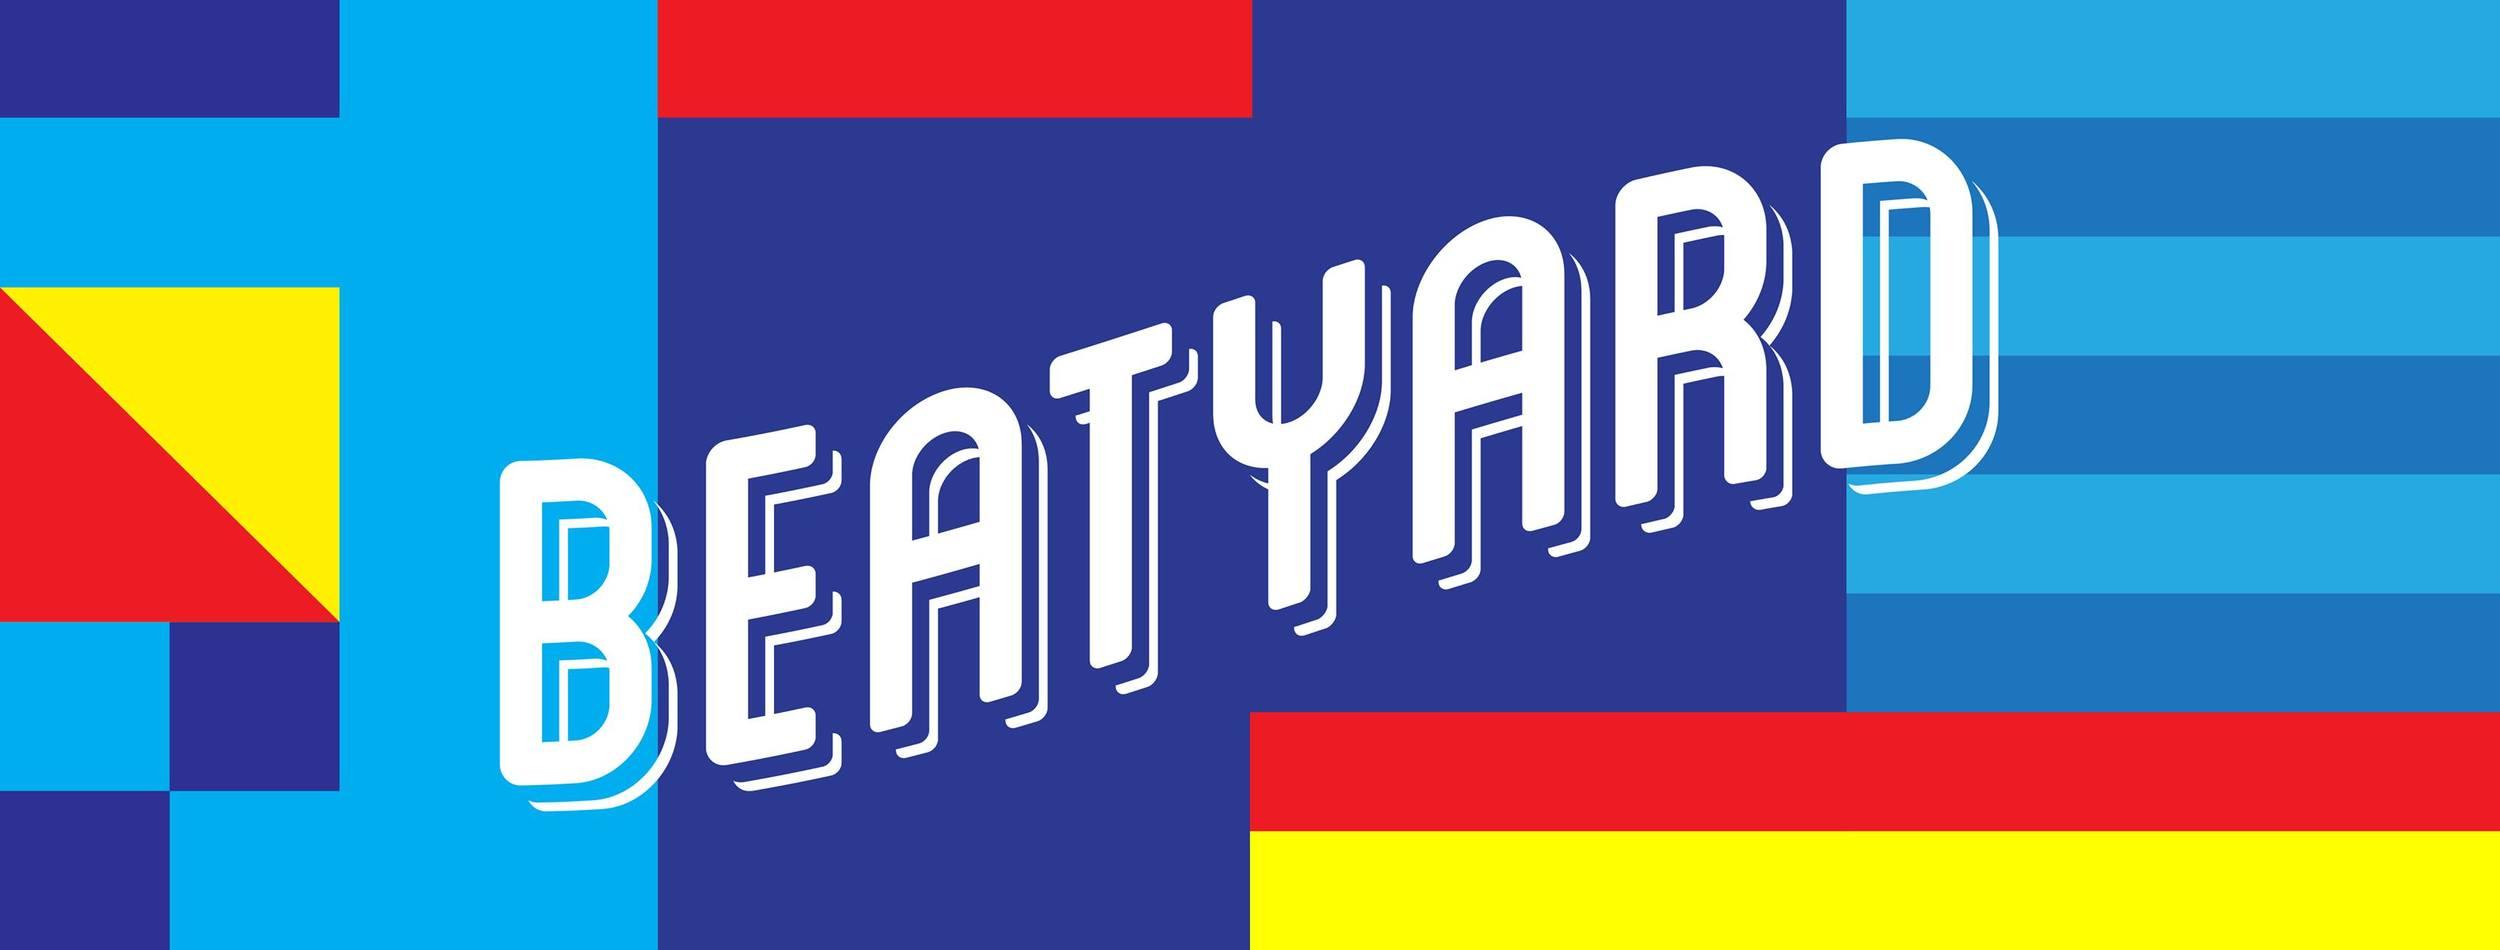 Beatyard - Upcoming Festivals in ireland